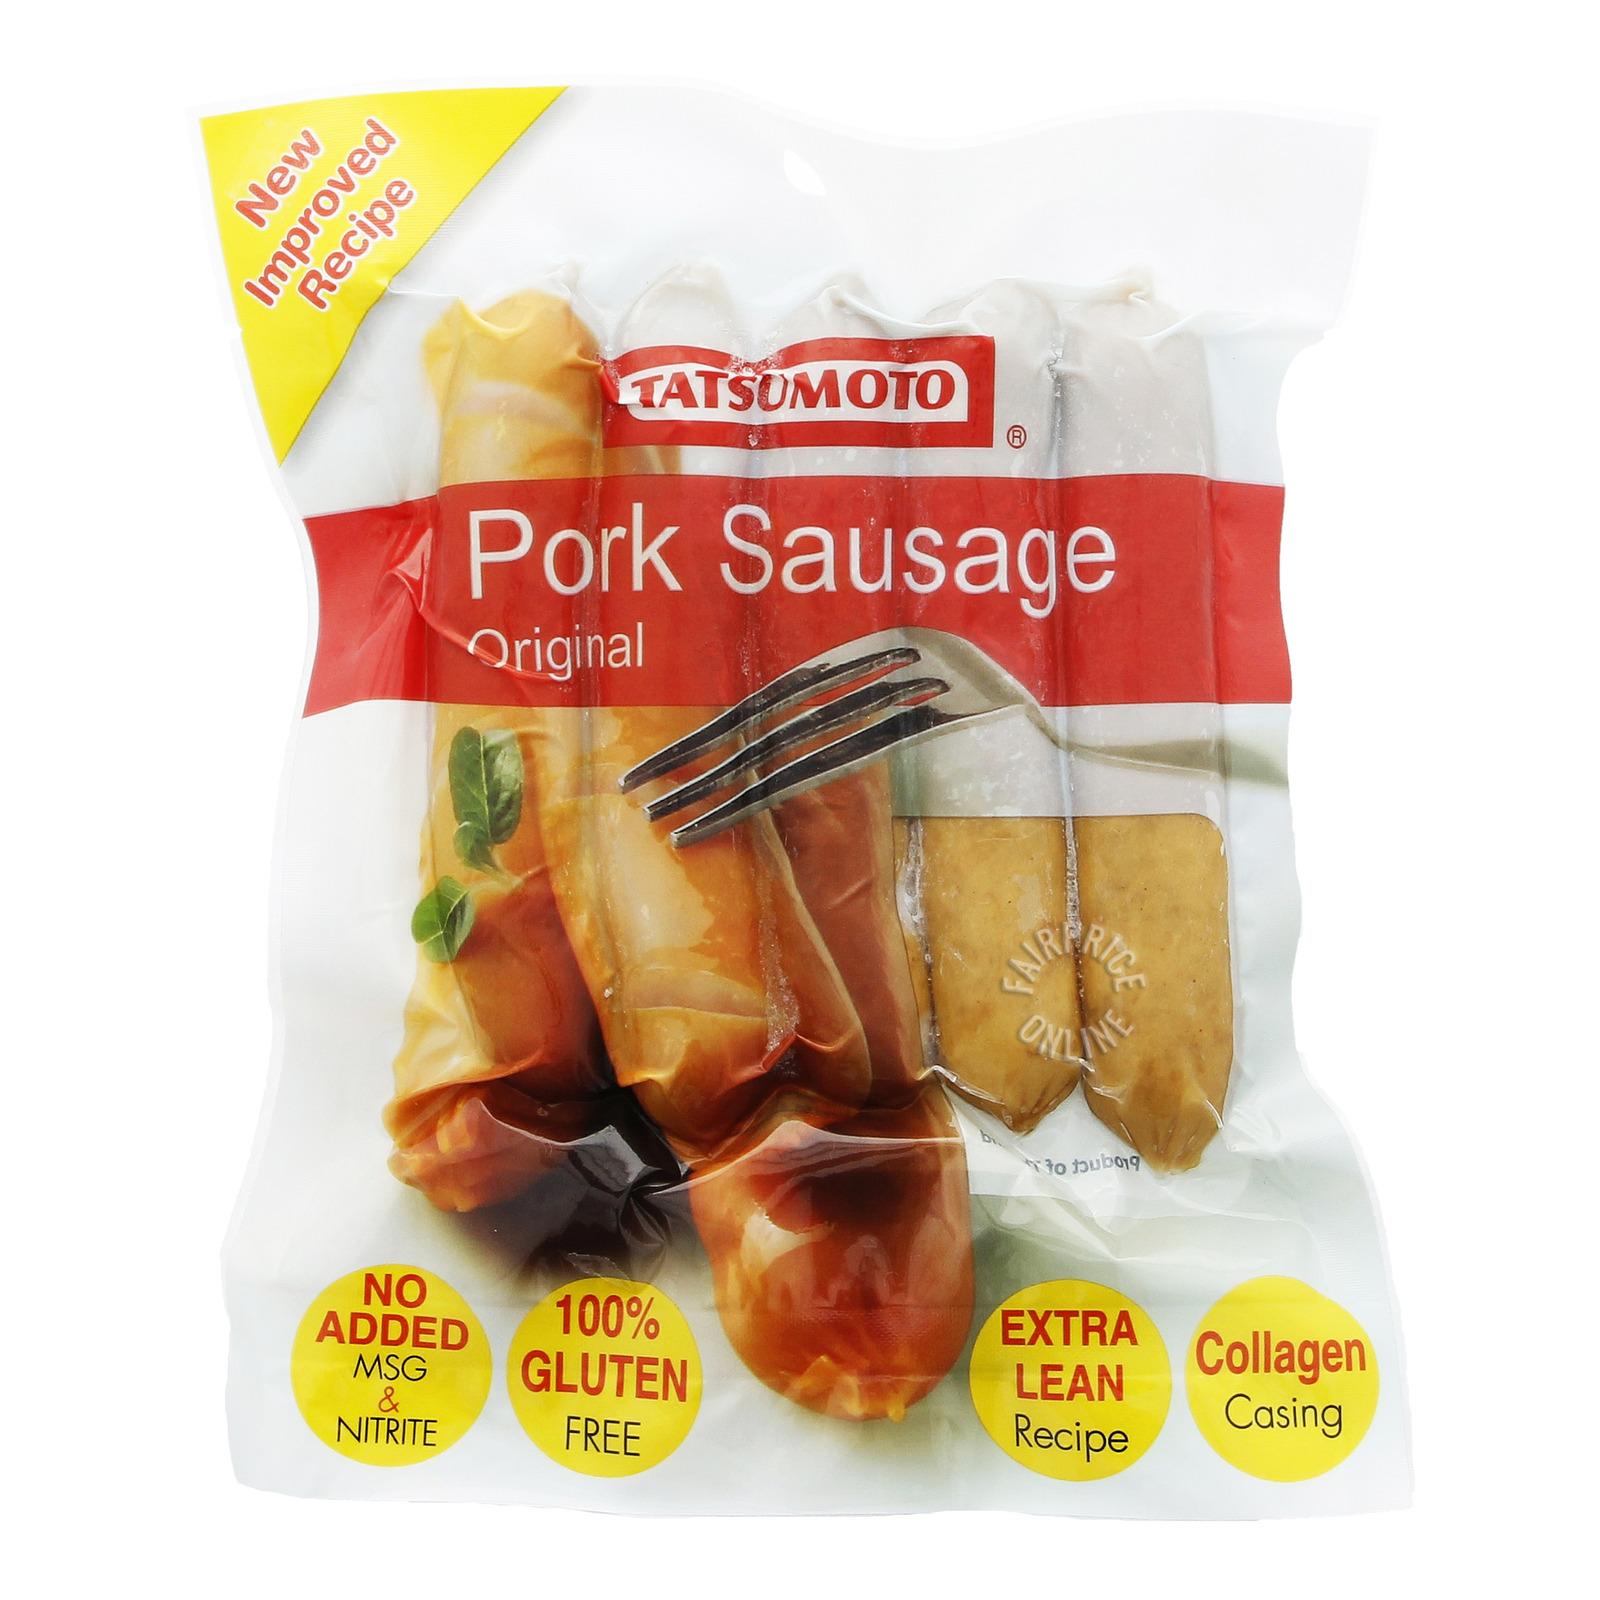 Tatsumoto Frozen Pork Sausage - Original